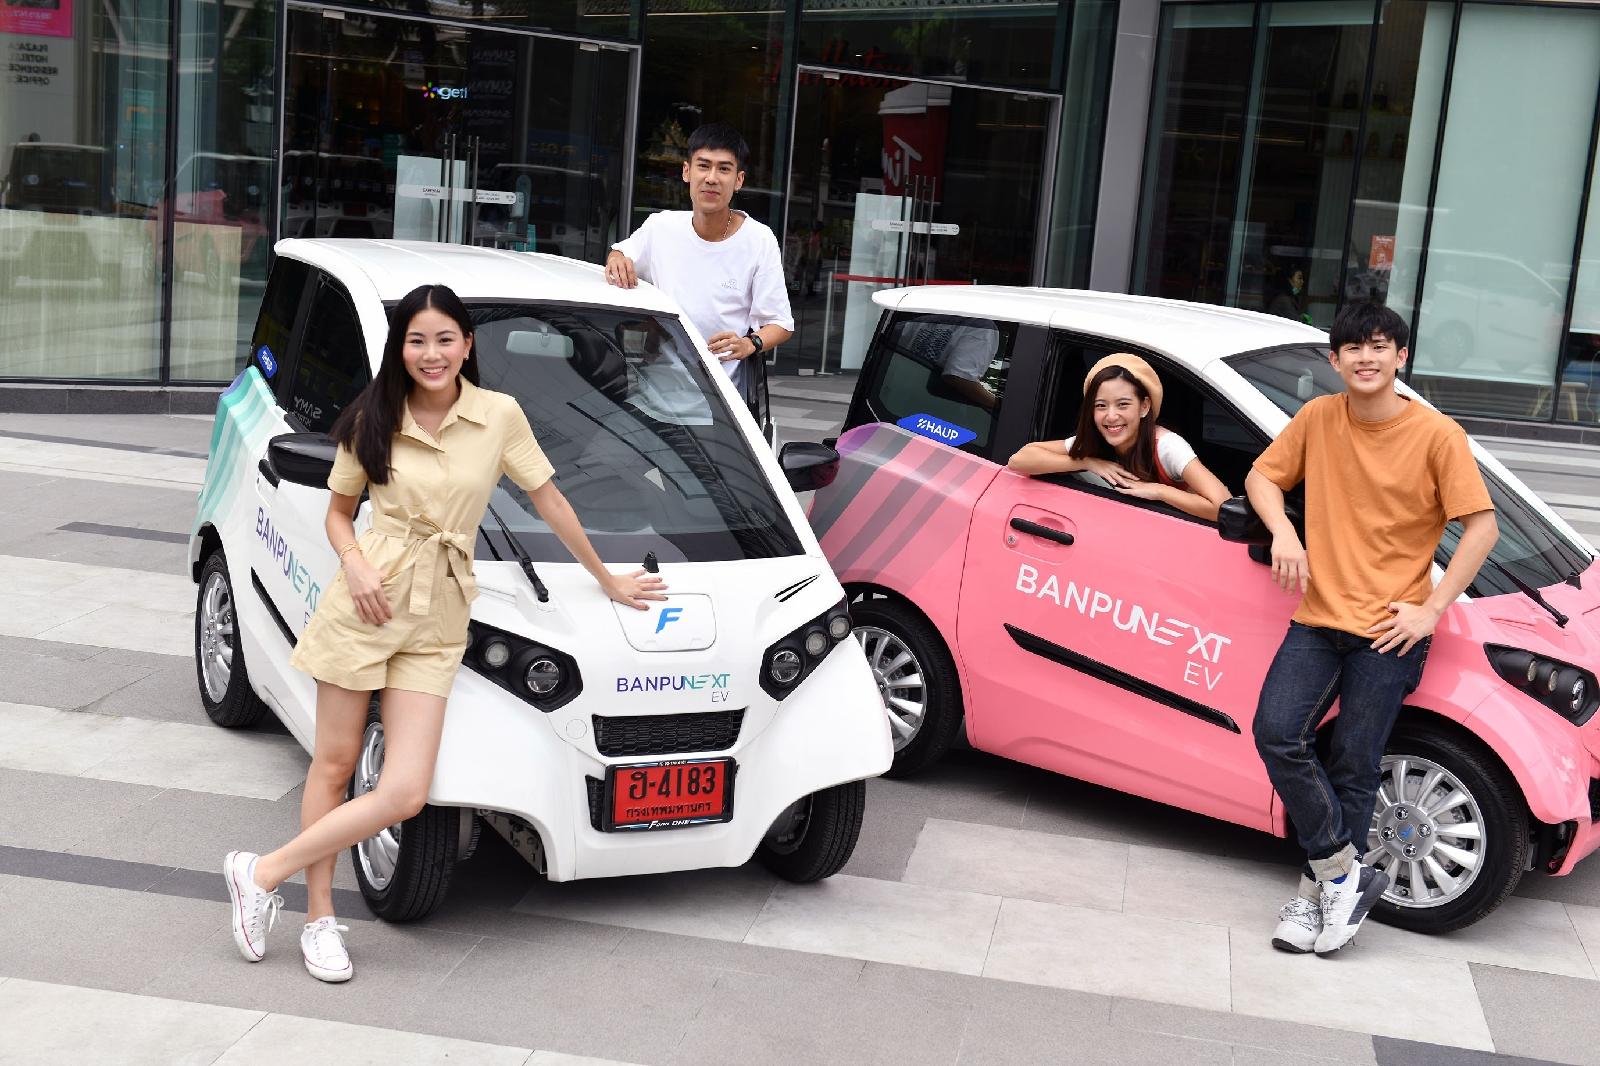 Banpu NEXT จับมือ HAUP CAR ร่วมผลักดันสมาร์ทโมบิลิตี้เสนอบริการเช่ารถยนต์ไฟฟ้า Banpu NEXT EV Car Sharing for Caring เติมเต็มการเดินทางให้สะดวกสบายยิ่งขึ้น